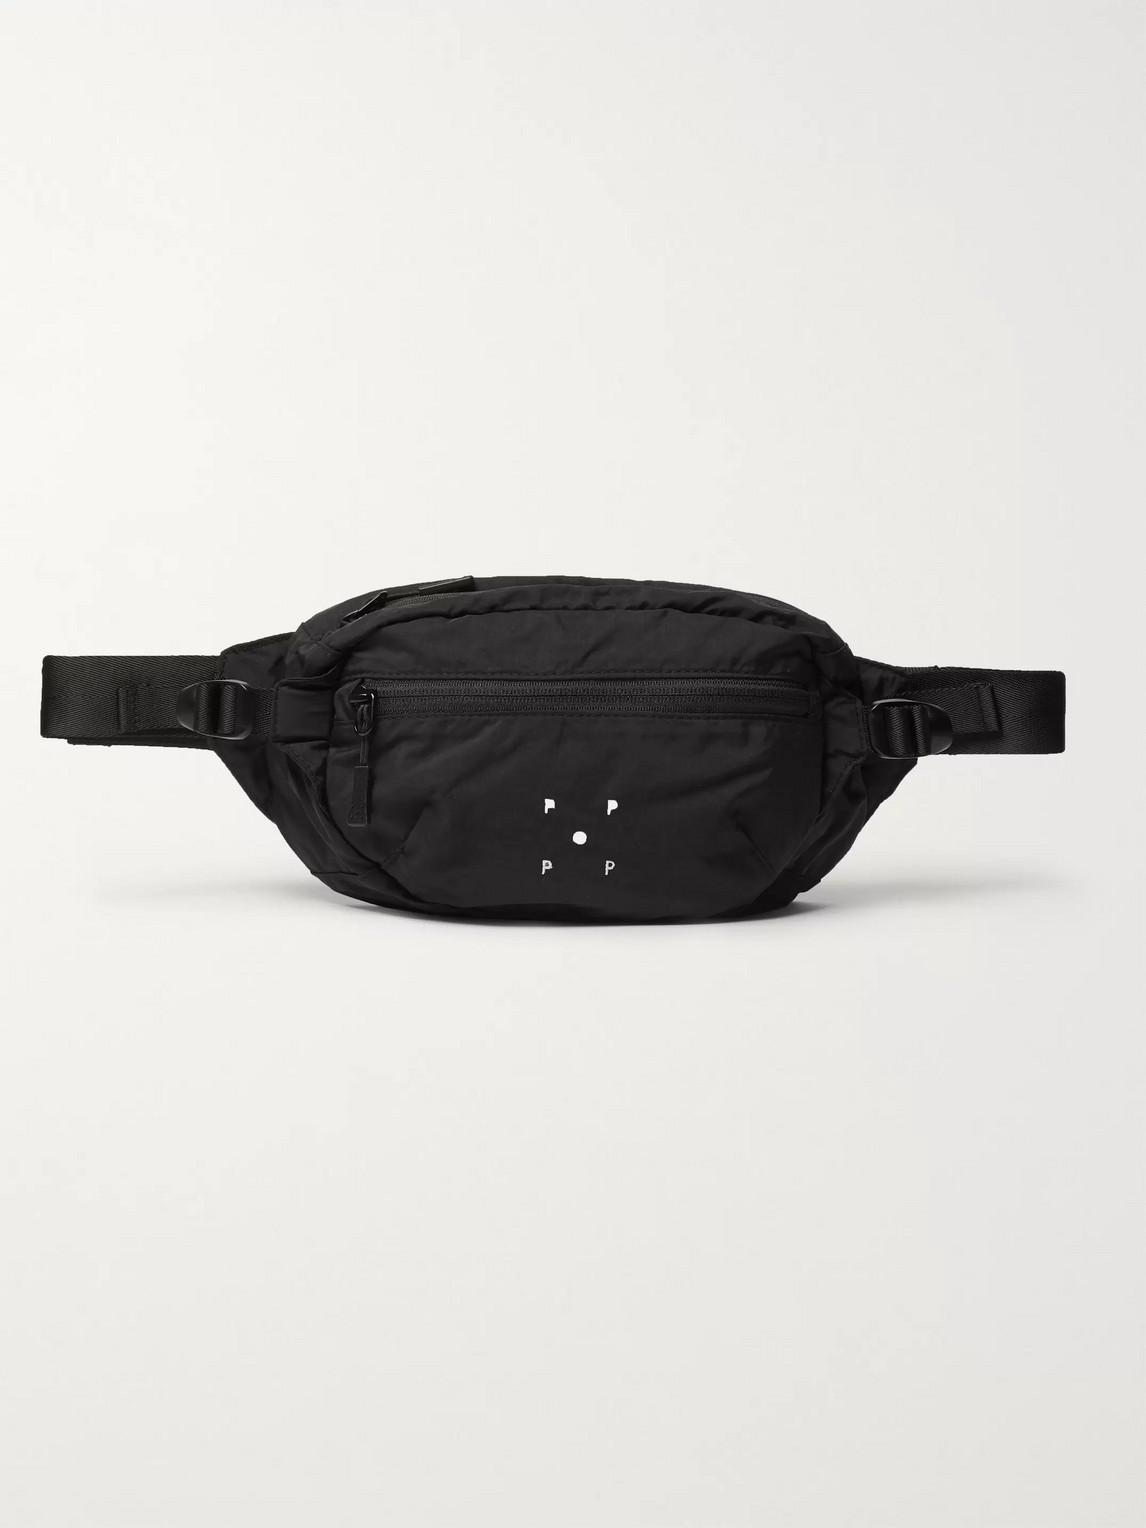 Pop Trading Company Logo-embroidered Nylon Belt Bag In Black